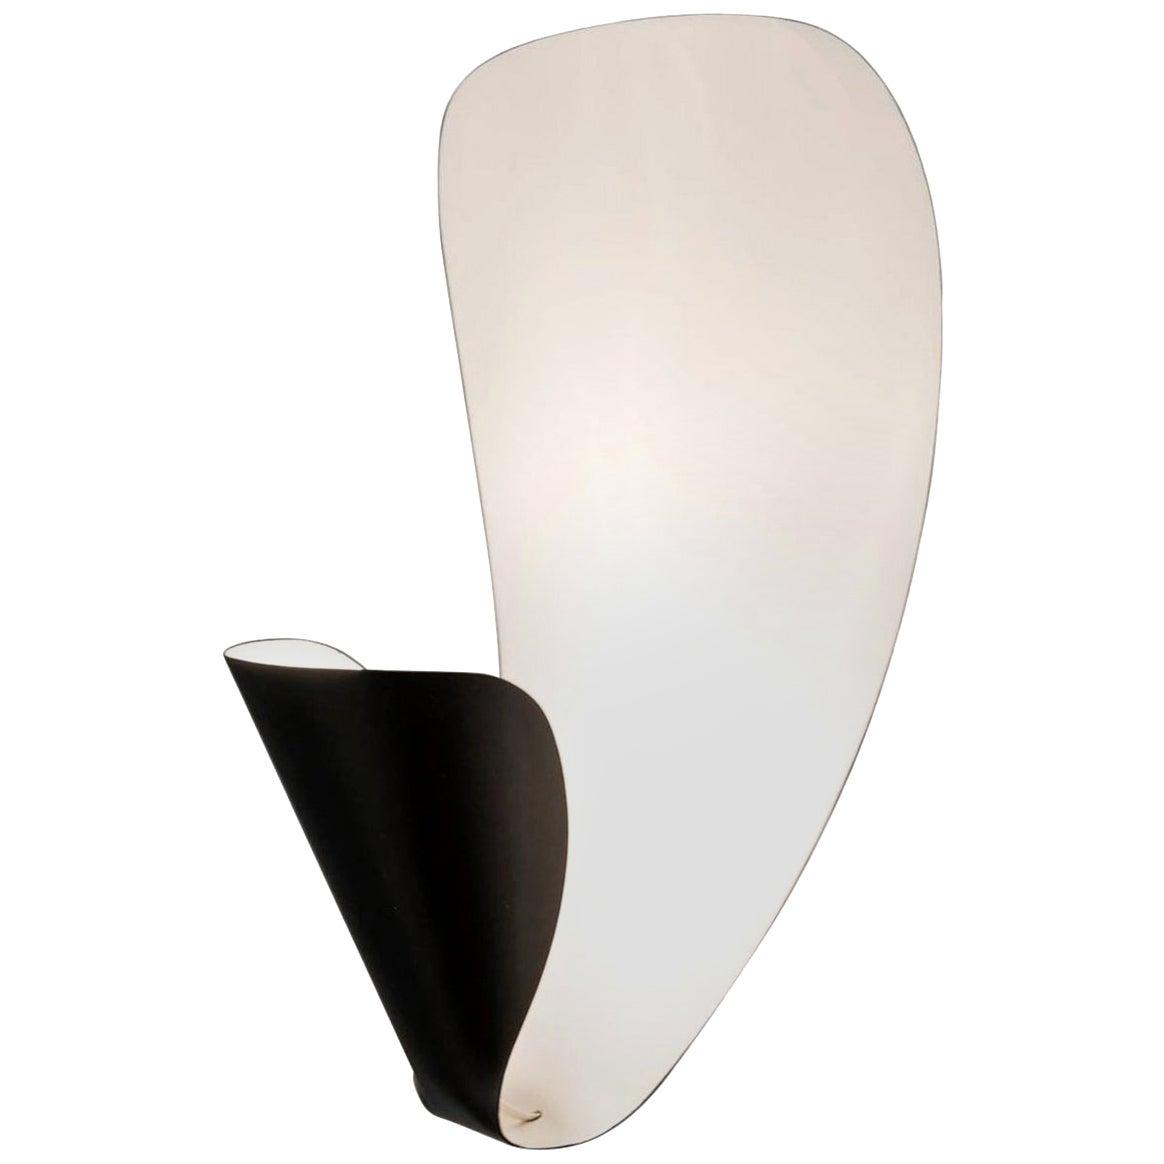 Michel Buffet Mid-Century Modern Black B206 Wall Sconce Lamp